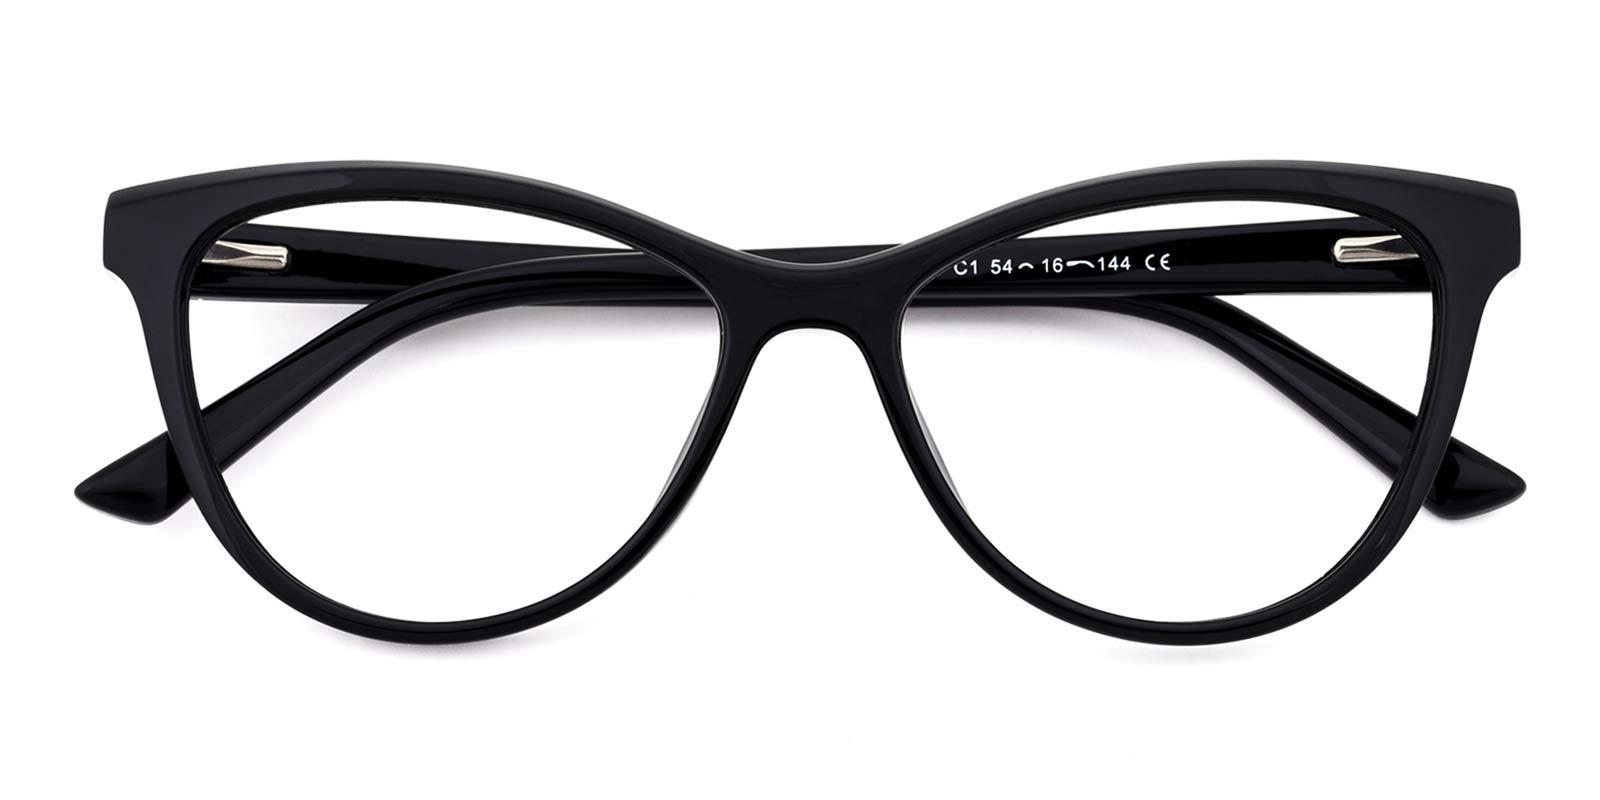 Diana-Black-Cat-TR-Eyeglasses-detail